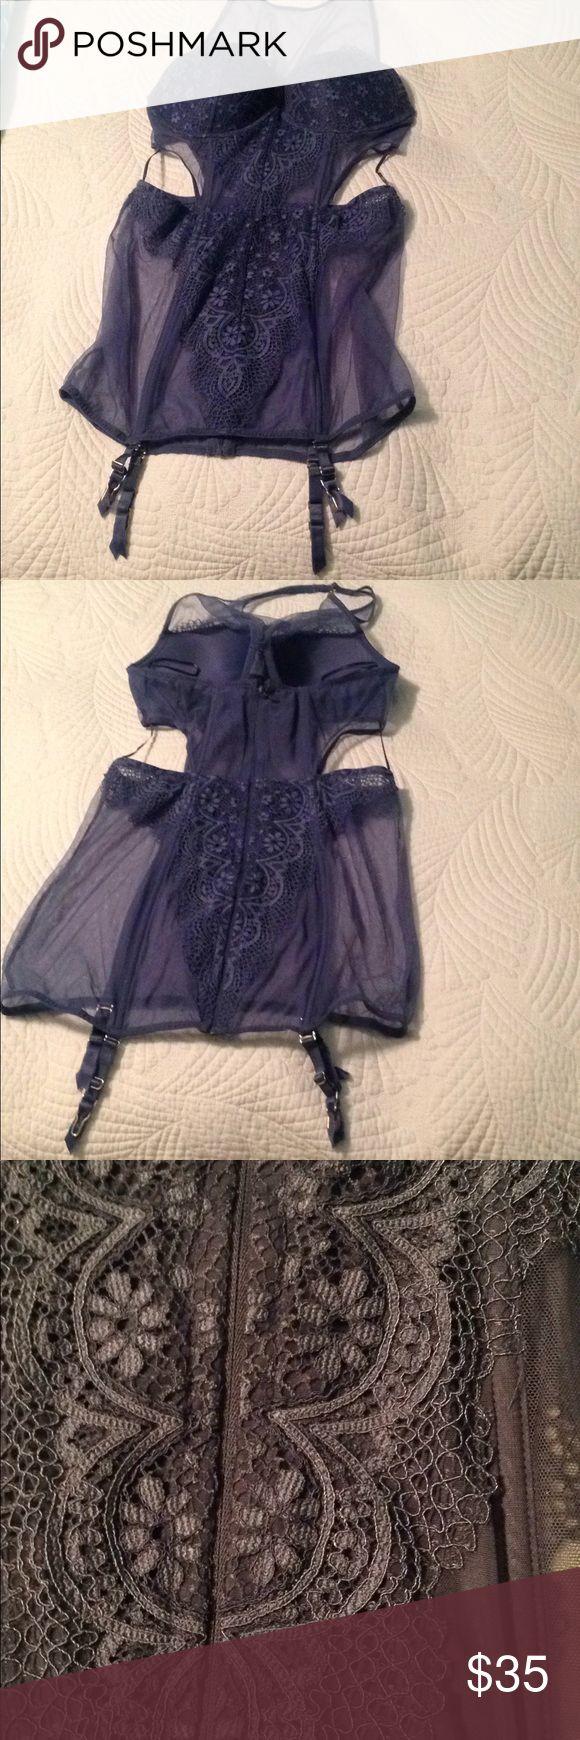 Victoria's Secret sexy corset Victoria's Secret very sexy net & lace corset with garters. Ready for Valentines fun. Size 36C. NWOT. Blue/ gray color. Victoria's Secret Intimates & Sleepwear